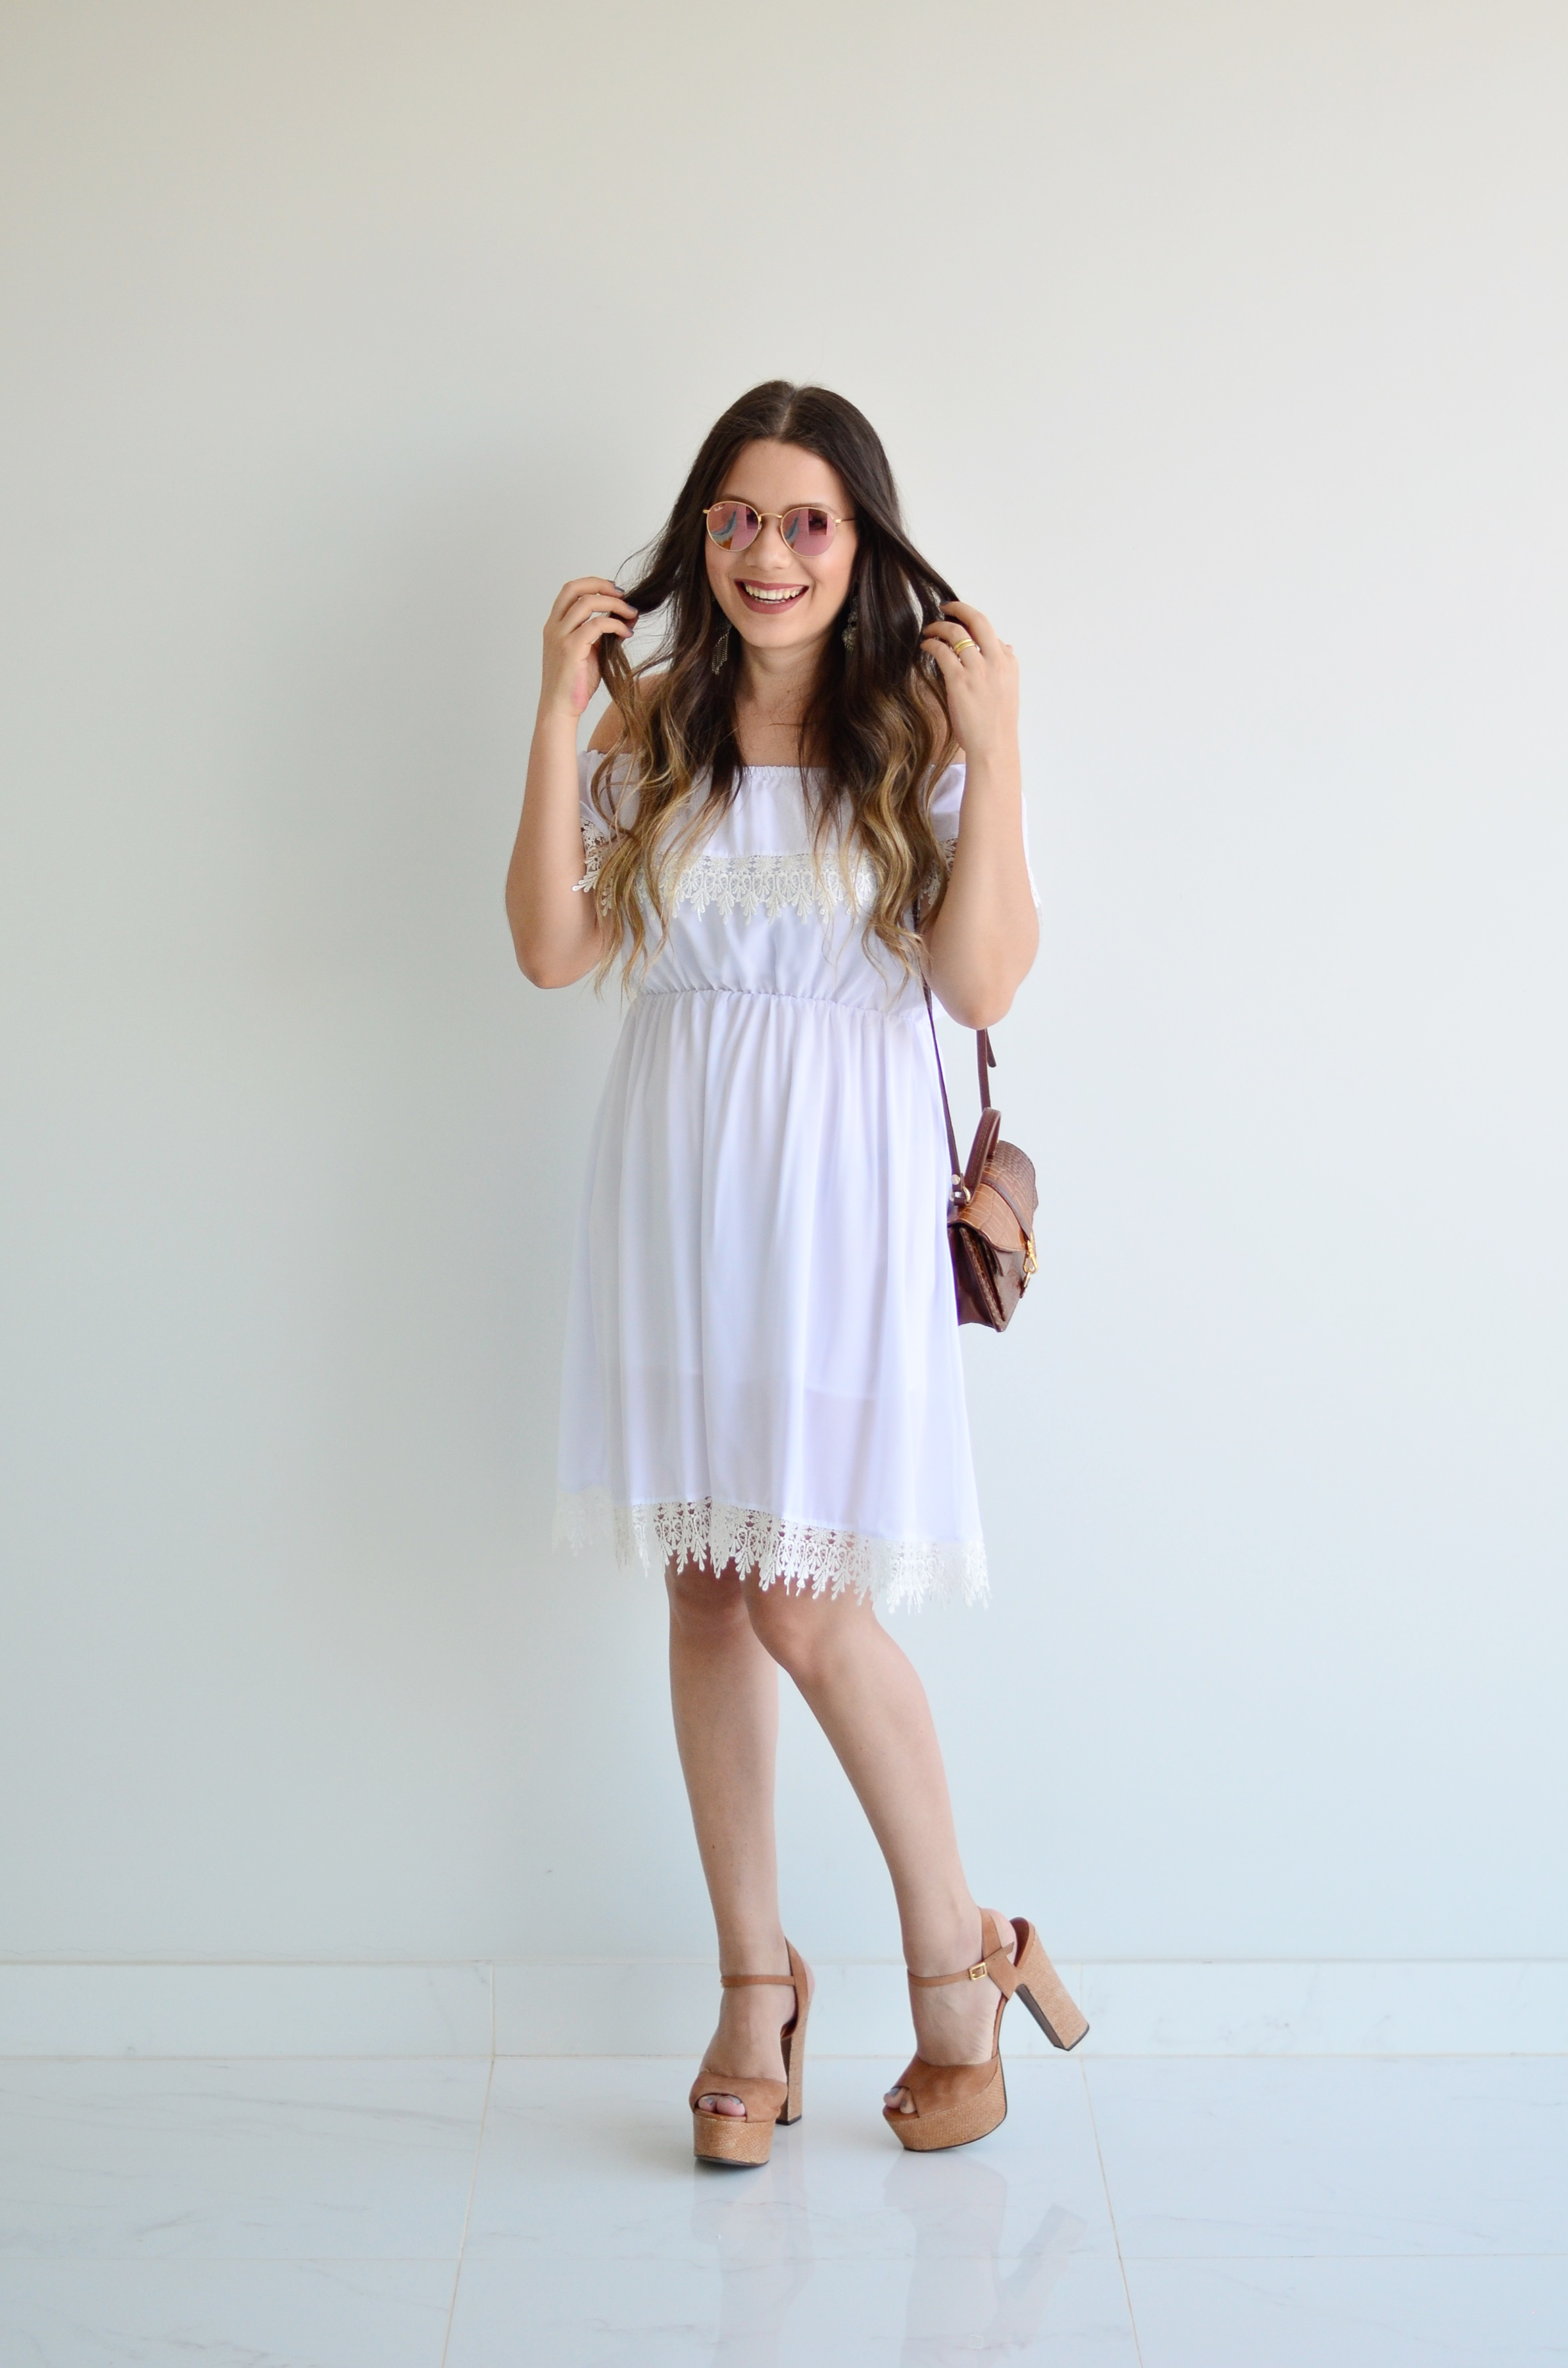 look-duplo-vestido-e-conjunto-branco-mini-bag-ft-alice-vivianny-9